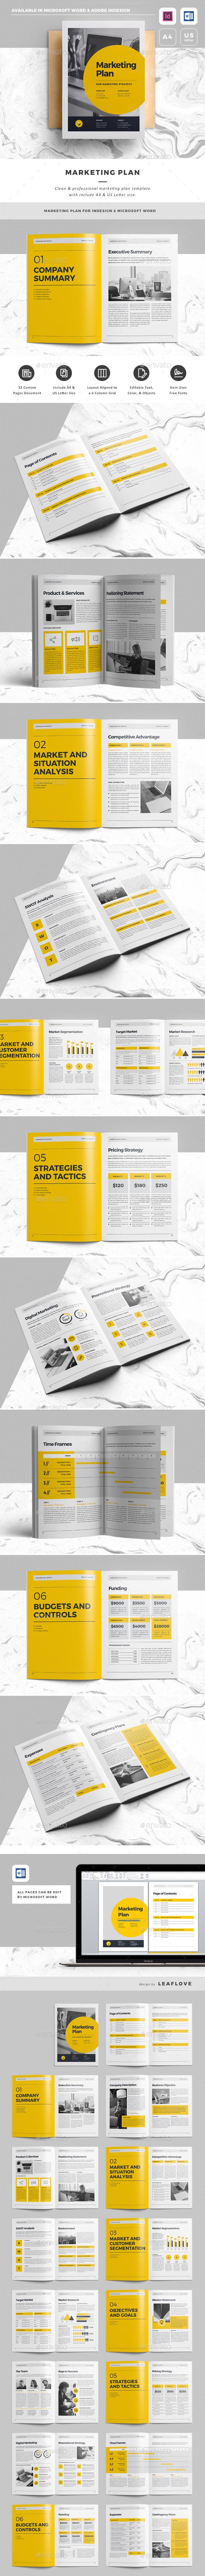 GraphicRiver Marketing Plan 20419910